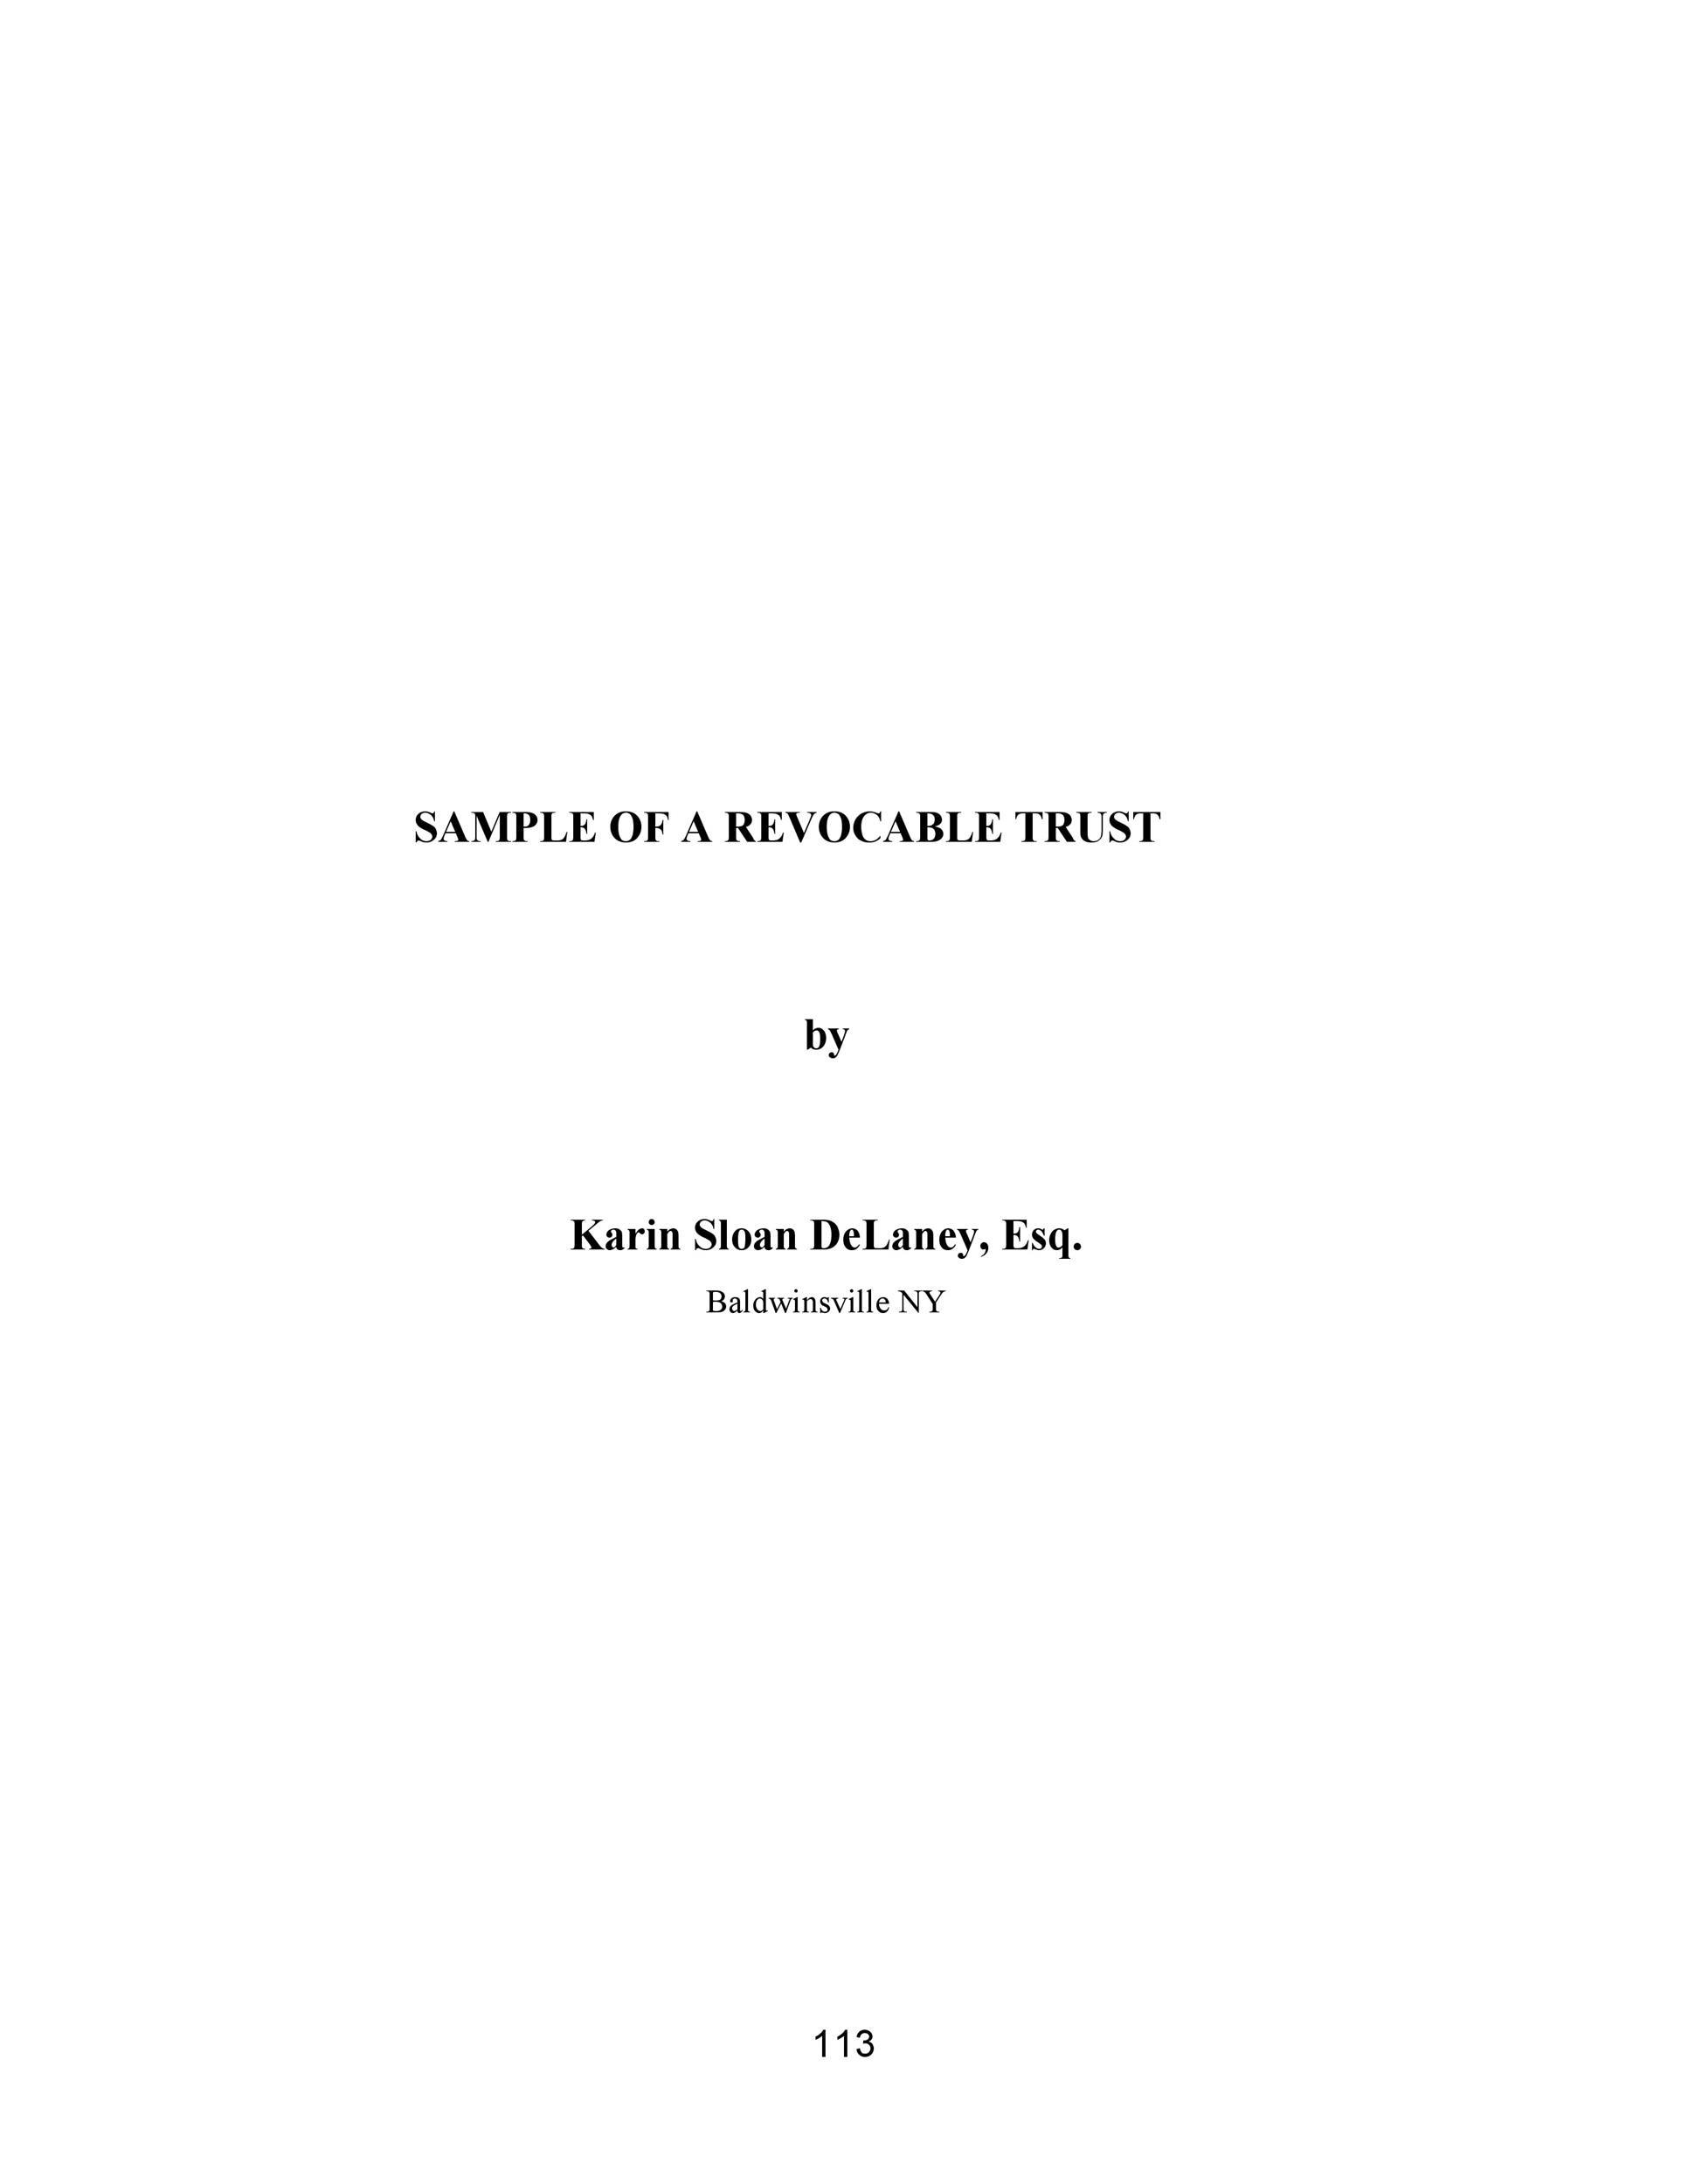 Free trust agreement 06